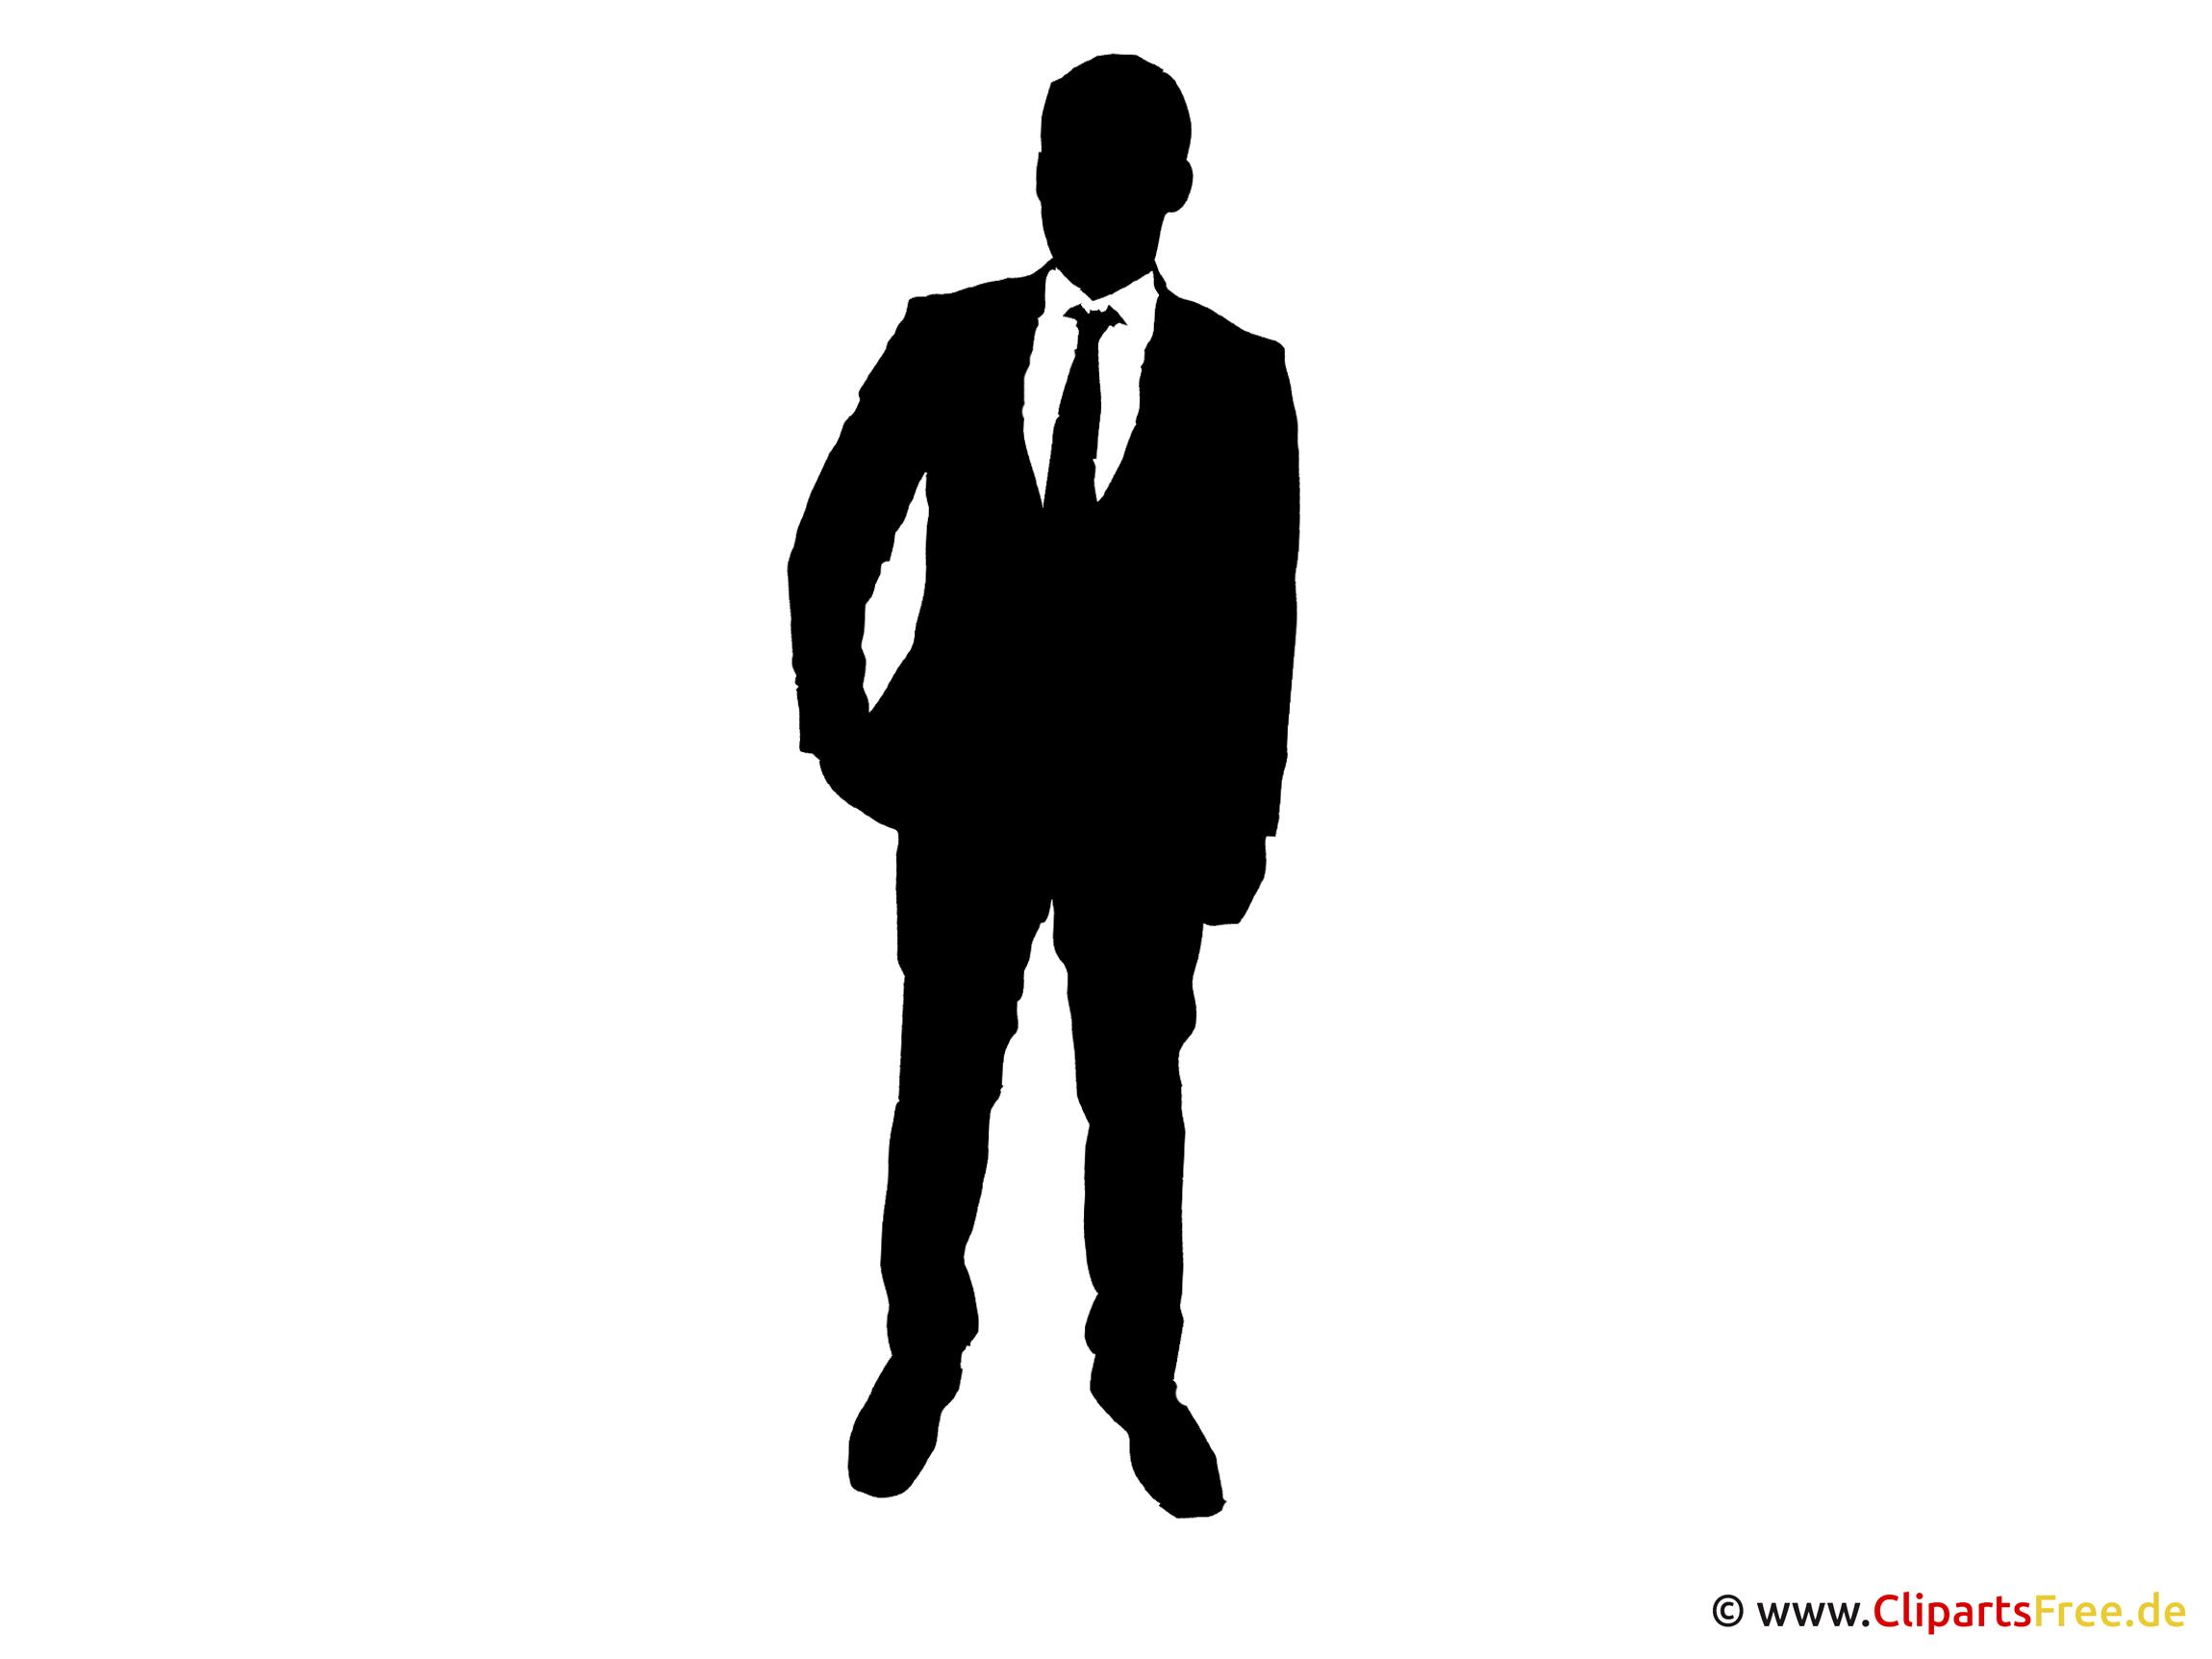 silhouette_business_man_clip_art_2014101